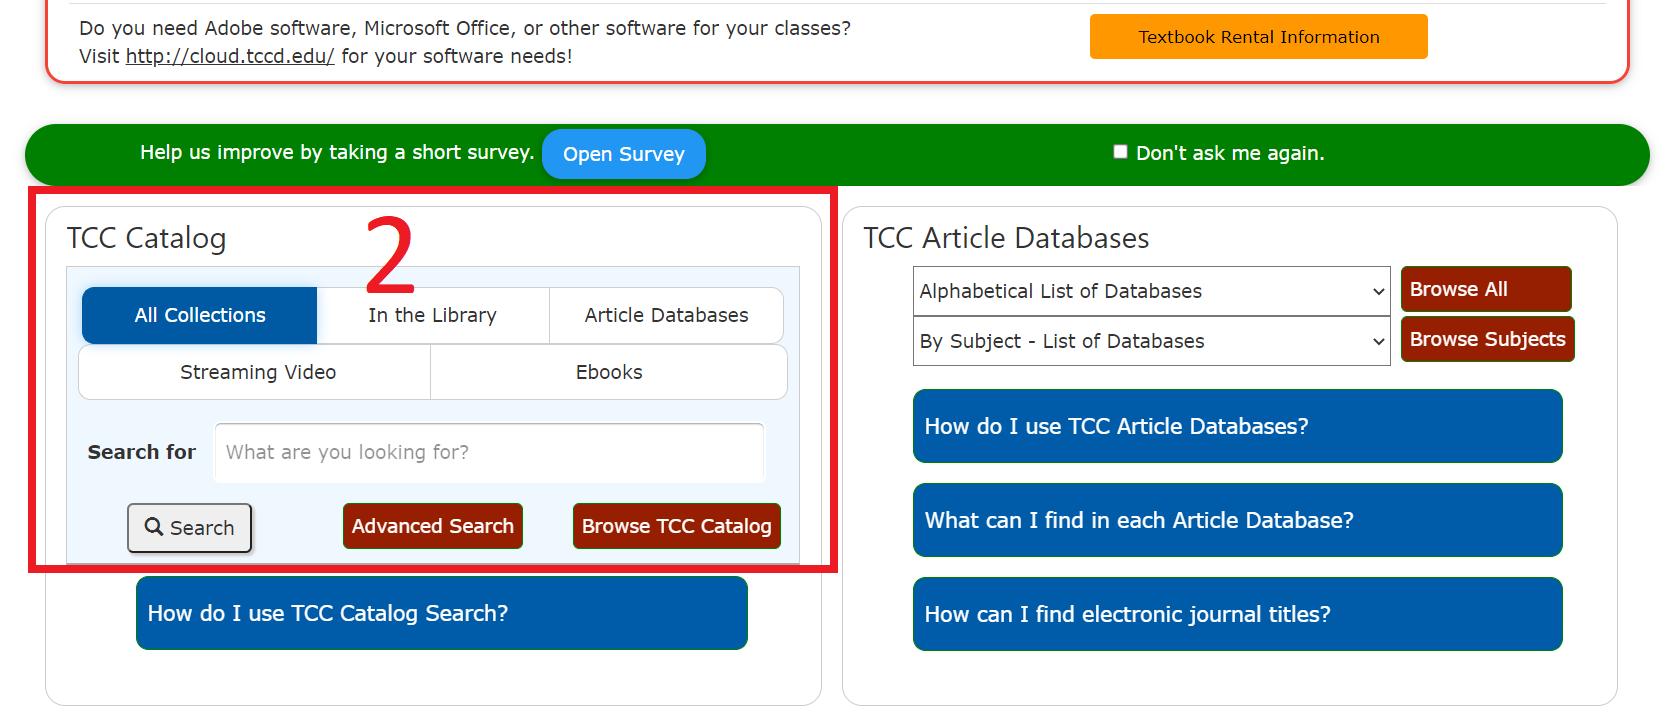 2 Scroll down to the TCC Catalog box